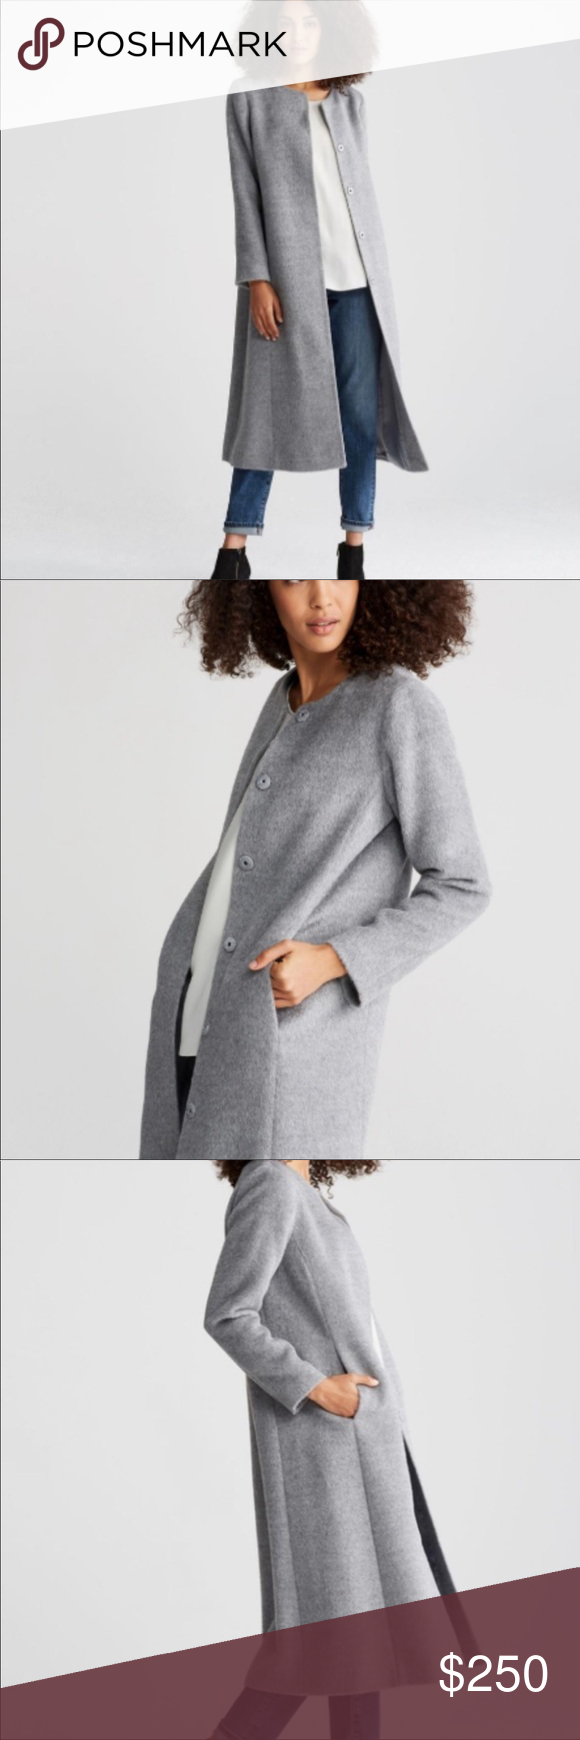 Eileen Fisher Alpaca Wool Suri Coat Xs Fit S M Eileen Fisher Coat Fit S [ 1740 x 580 Pixel ]